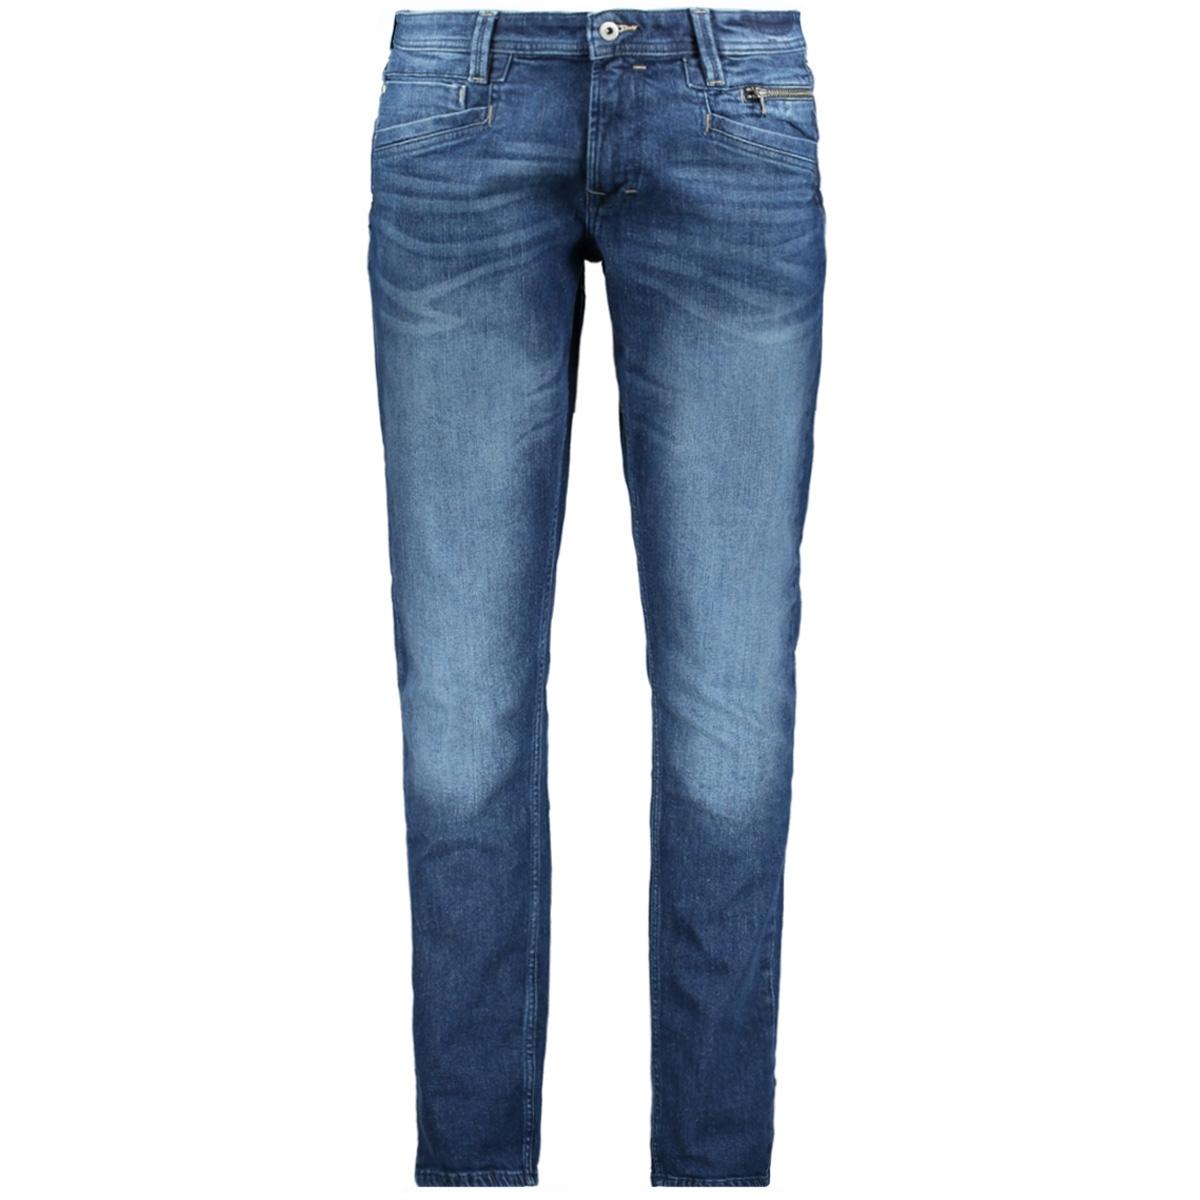 038cc2b002 edc jeans c901